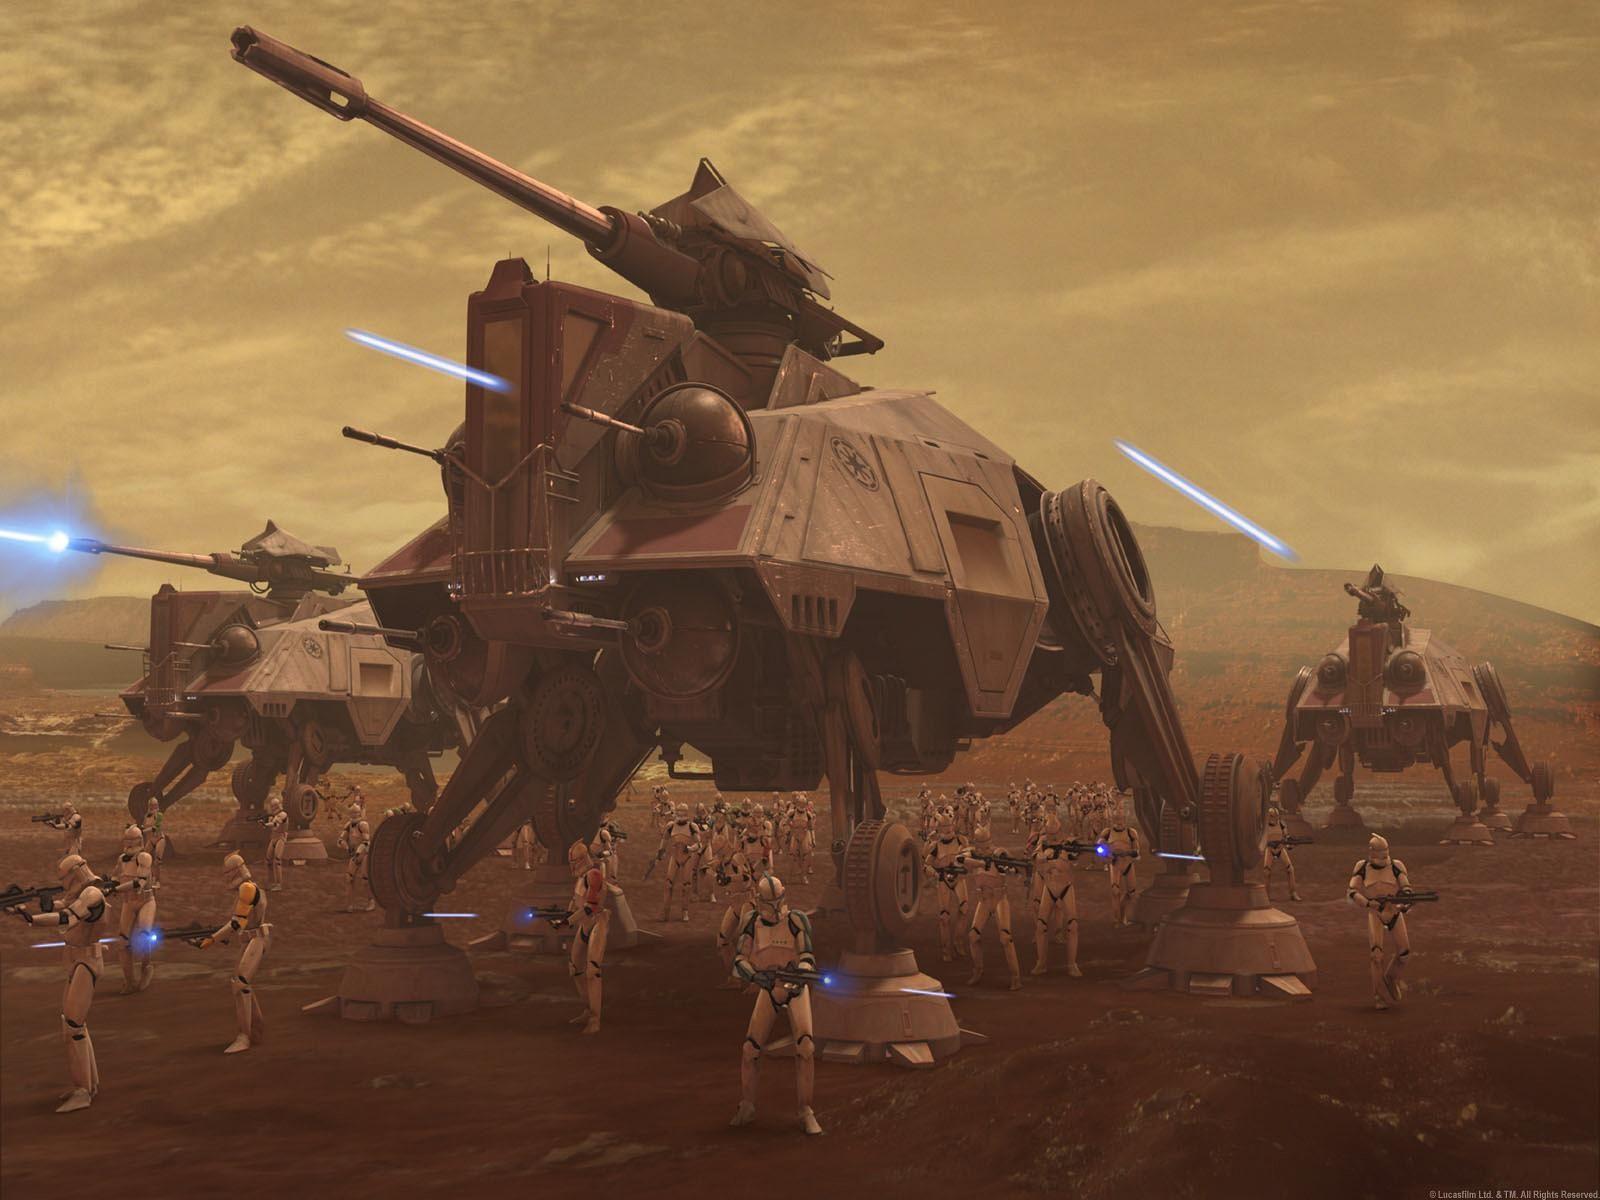 Battle Of Geonosis Star Wars Images Star Wars Ships Star Wars Wallpaper